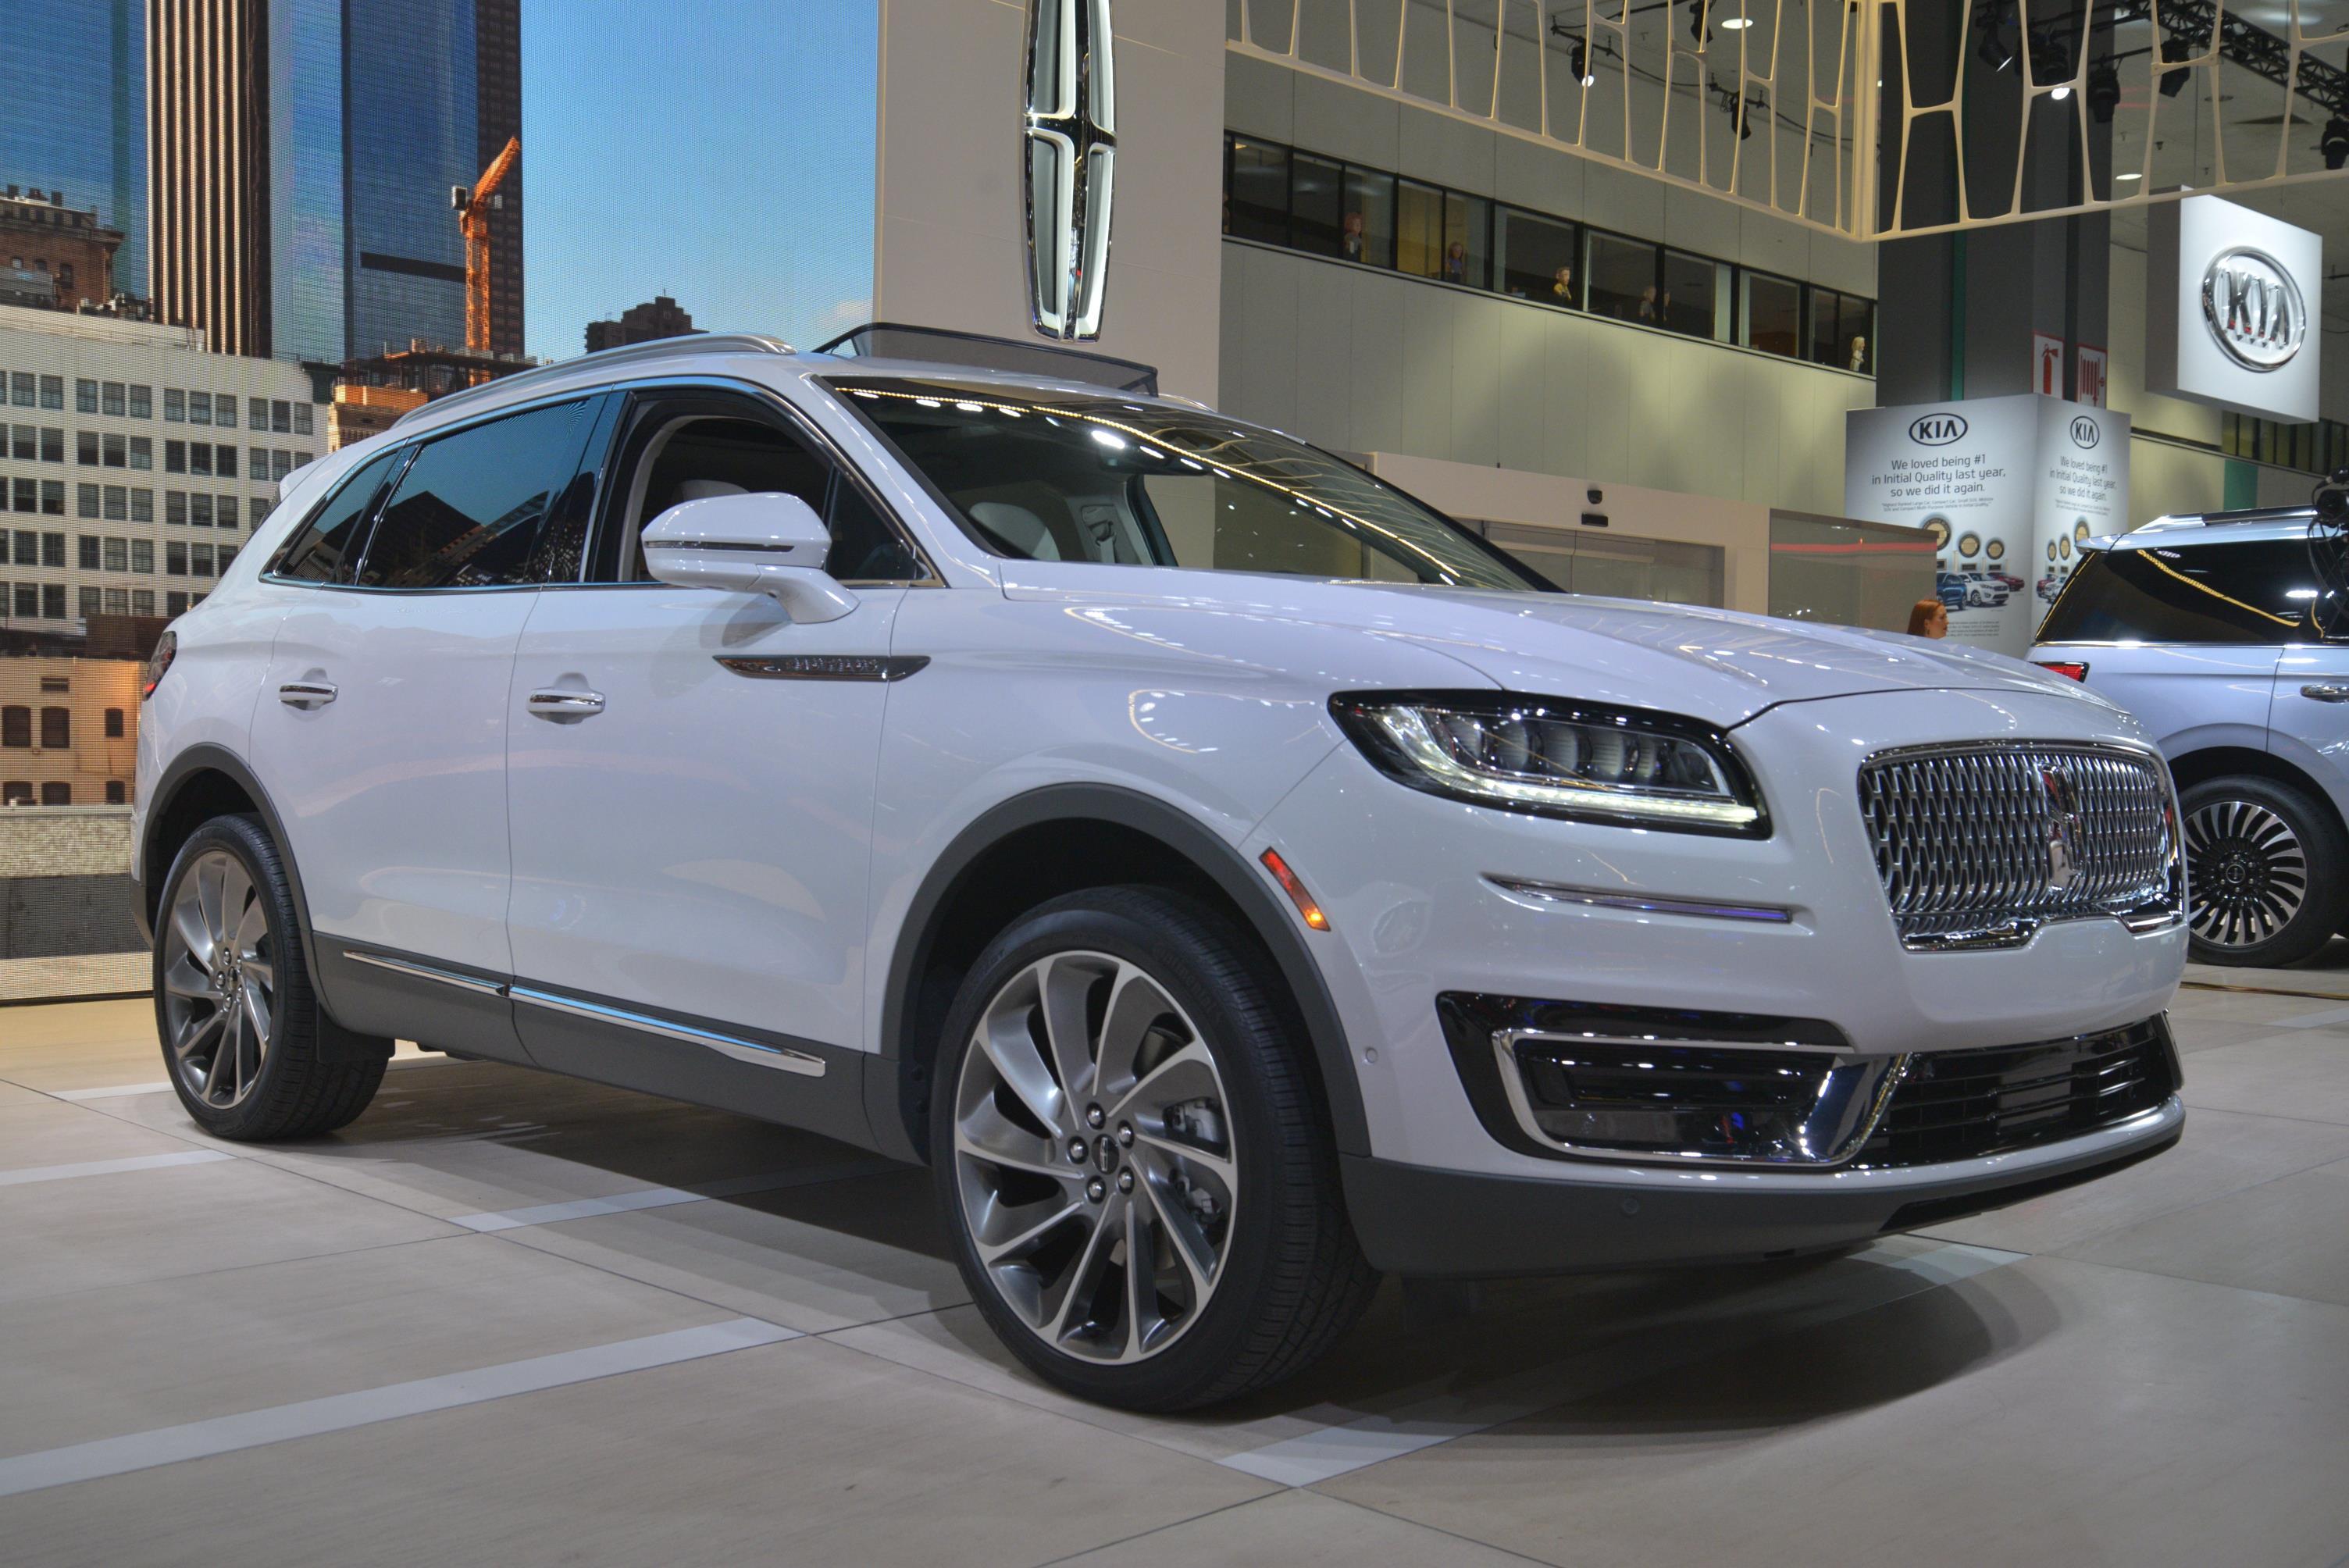 Luxury Auto Sales >> NEW 2019 LINCOLN MKC - myAutoWorld.com